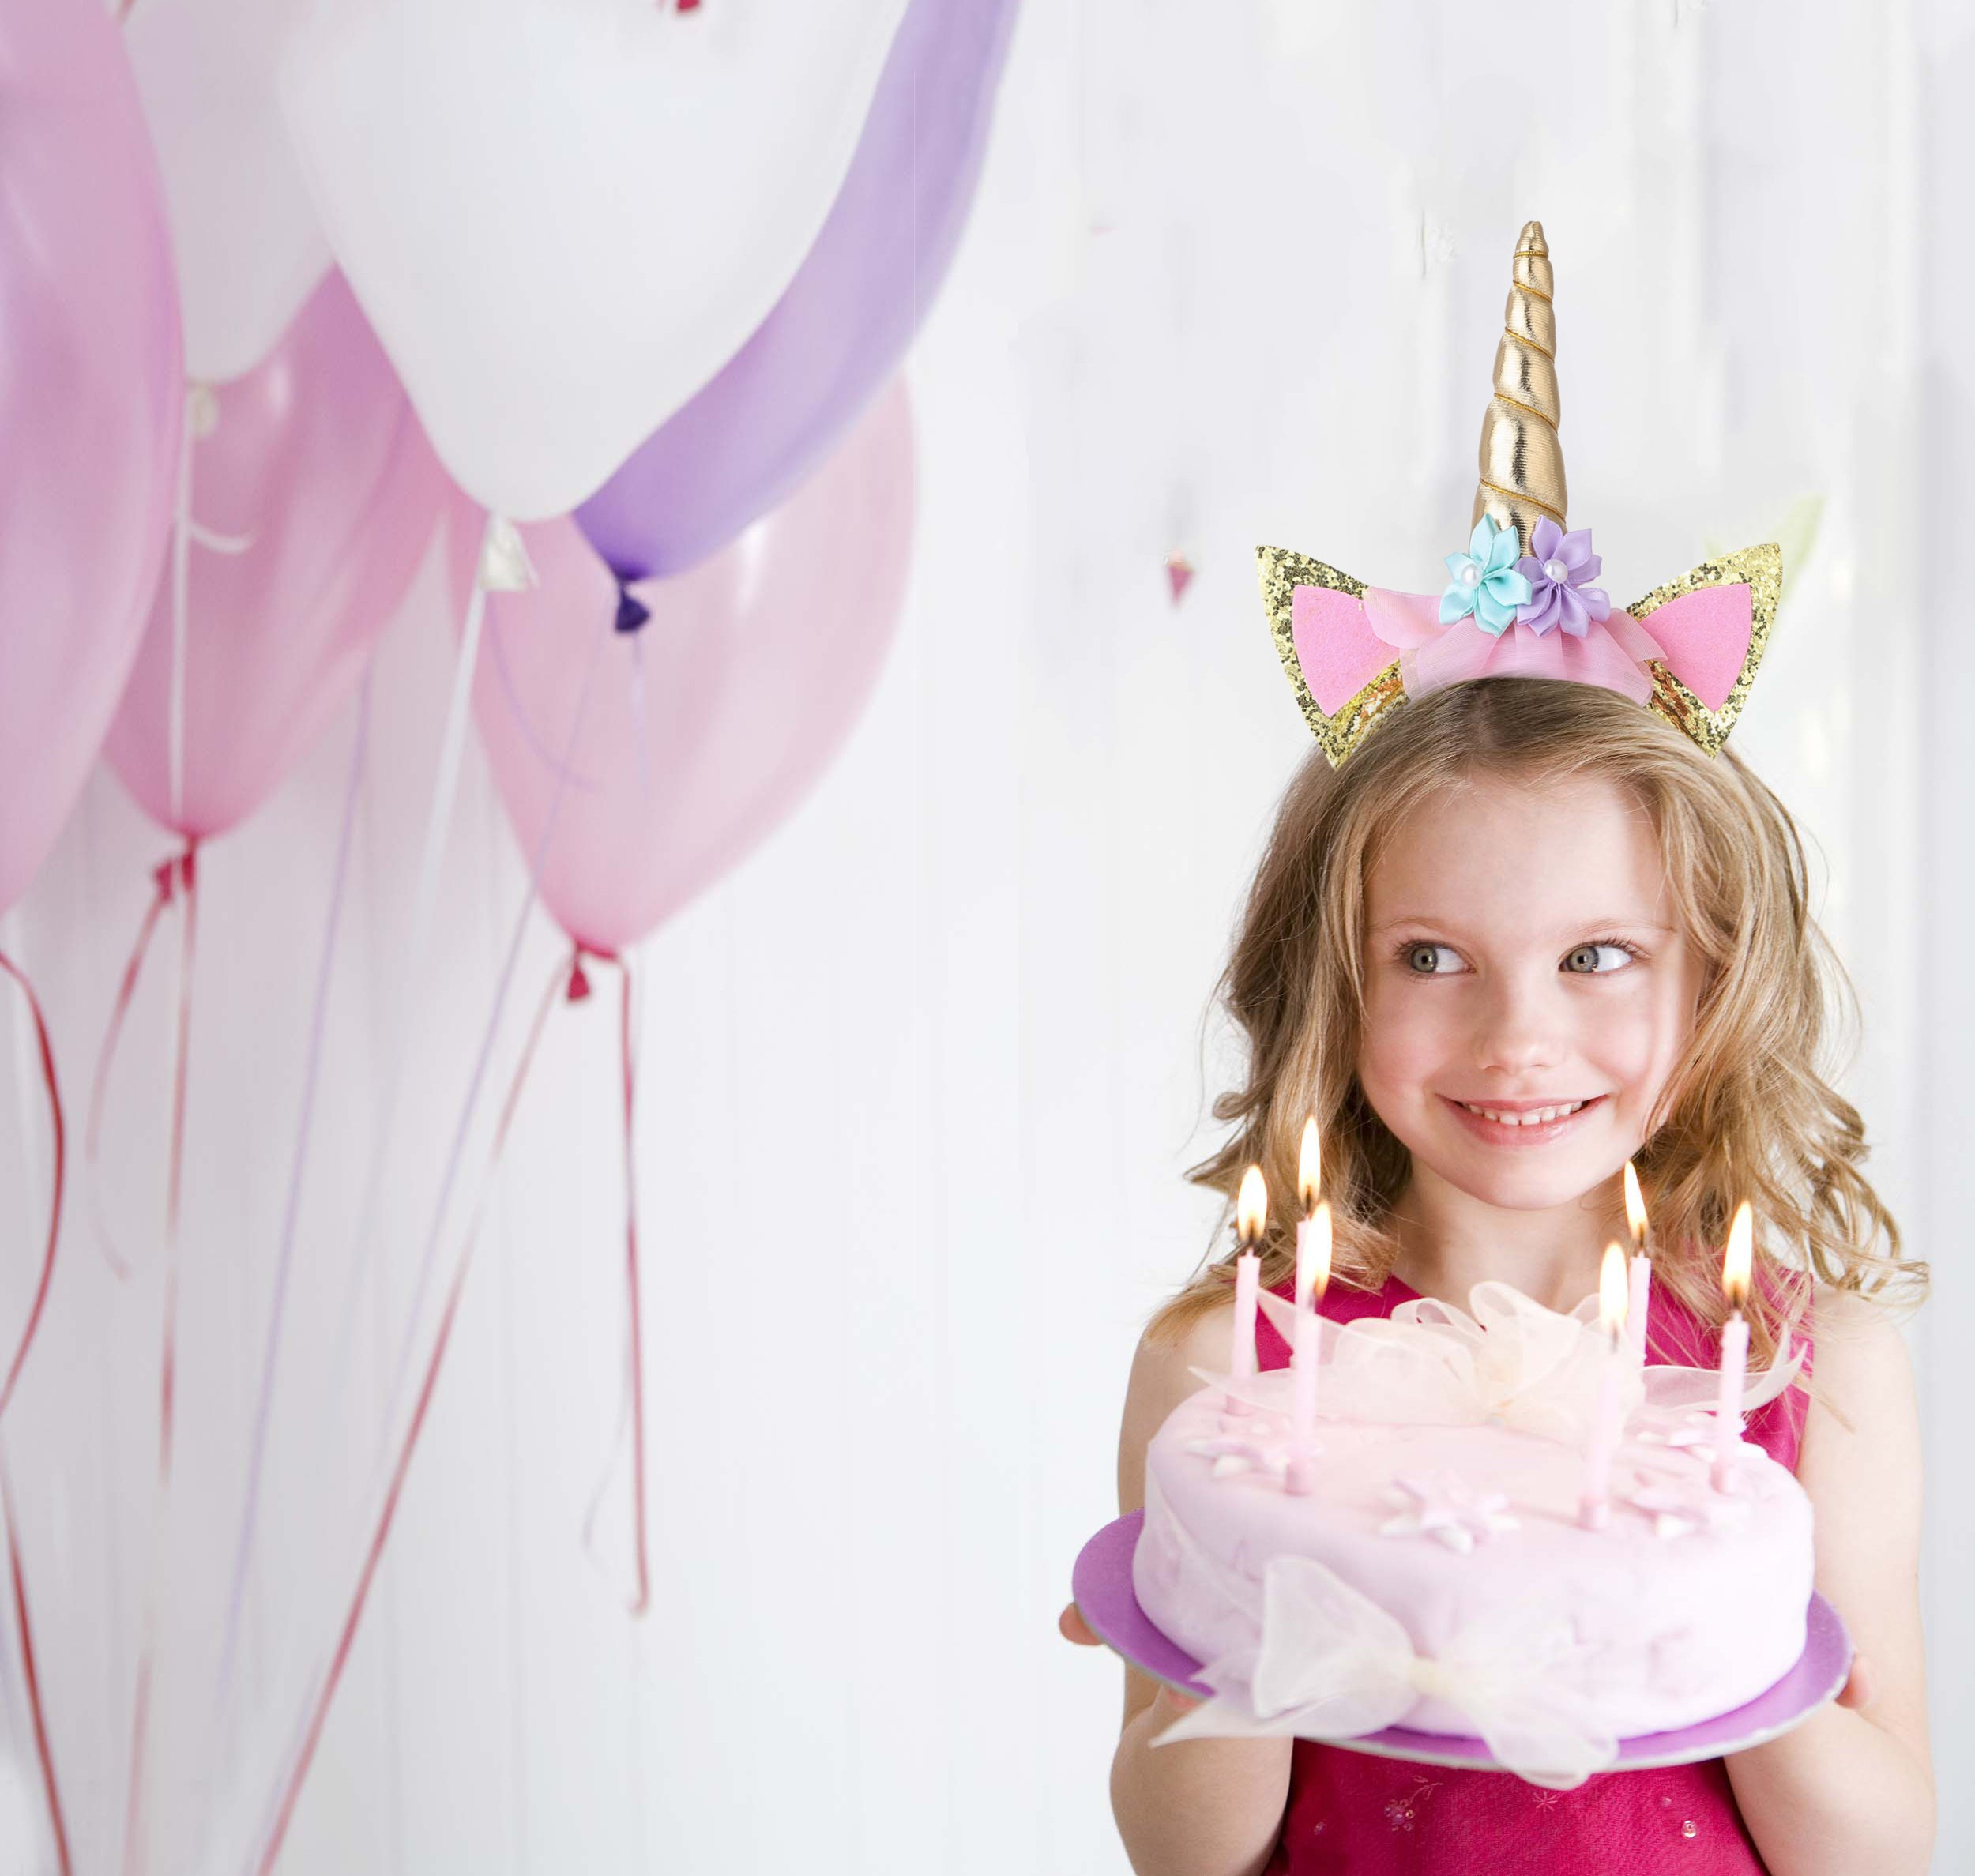 Cooper Fun Unicorn Birthday Set of Gold Glitter Unicorn Headband Pink Satin Sash for Happy Birthday Unicorn Party… 4